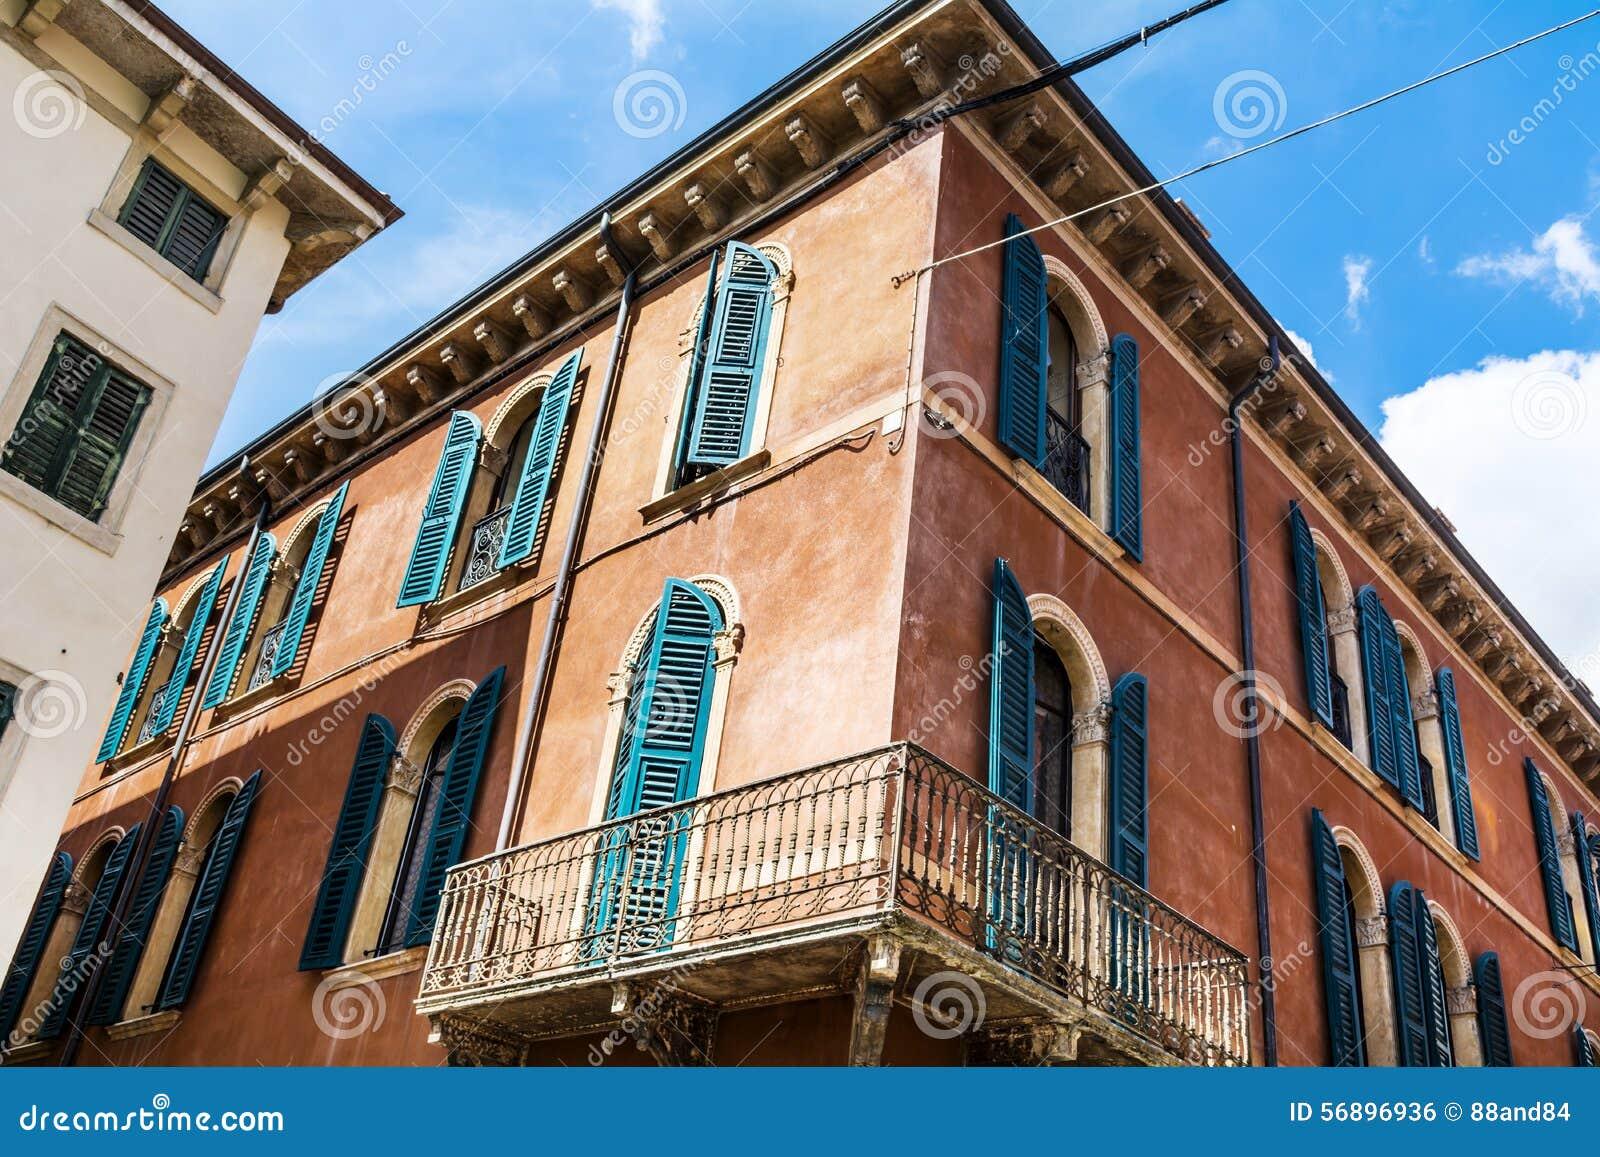 Typisk Orange Byggnad Med Antika Fönster I Verona Arkivfoto - Bild ... : antika fönster : Fönster